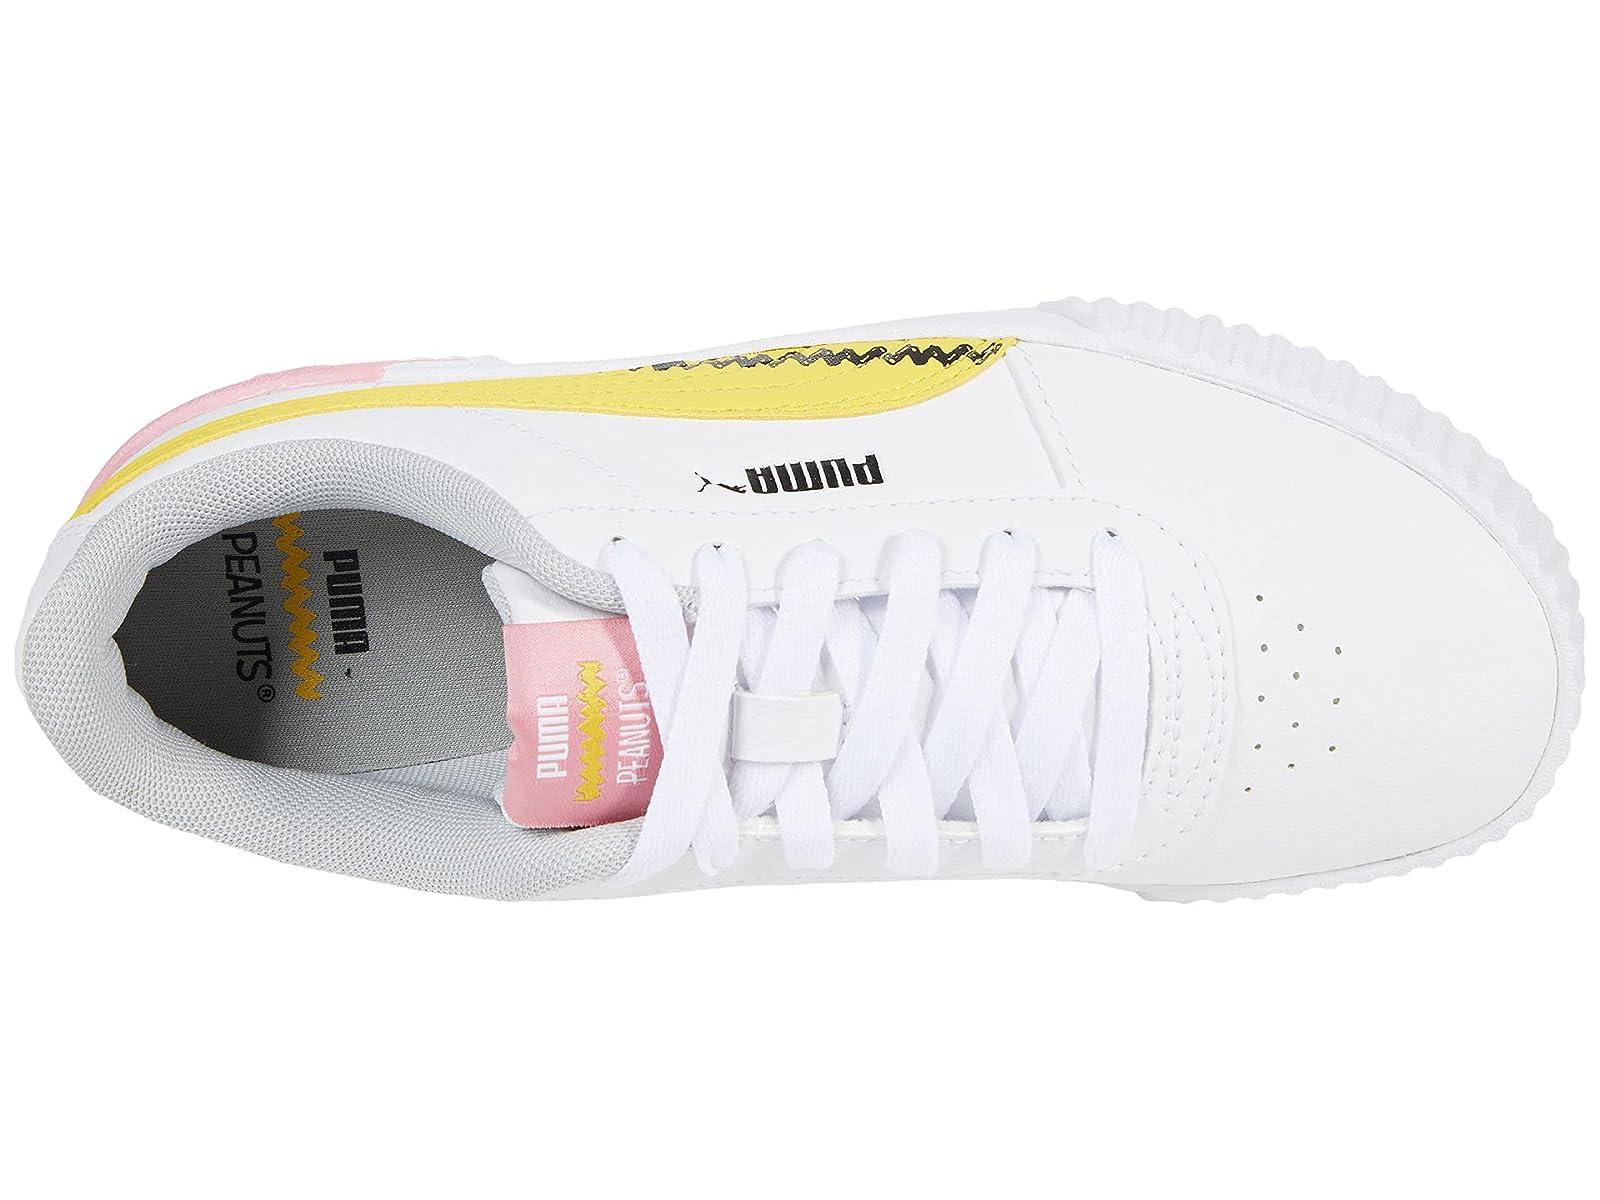 thumbnail 3 - Girl's Sneakers & Athletic Shoes PUMA Kids Peanuts Carina (Big Kid)